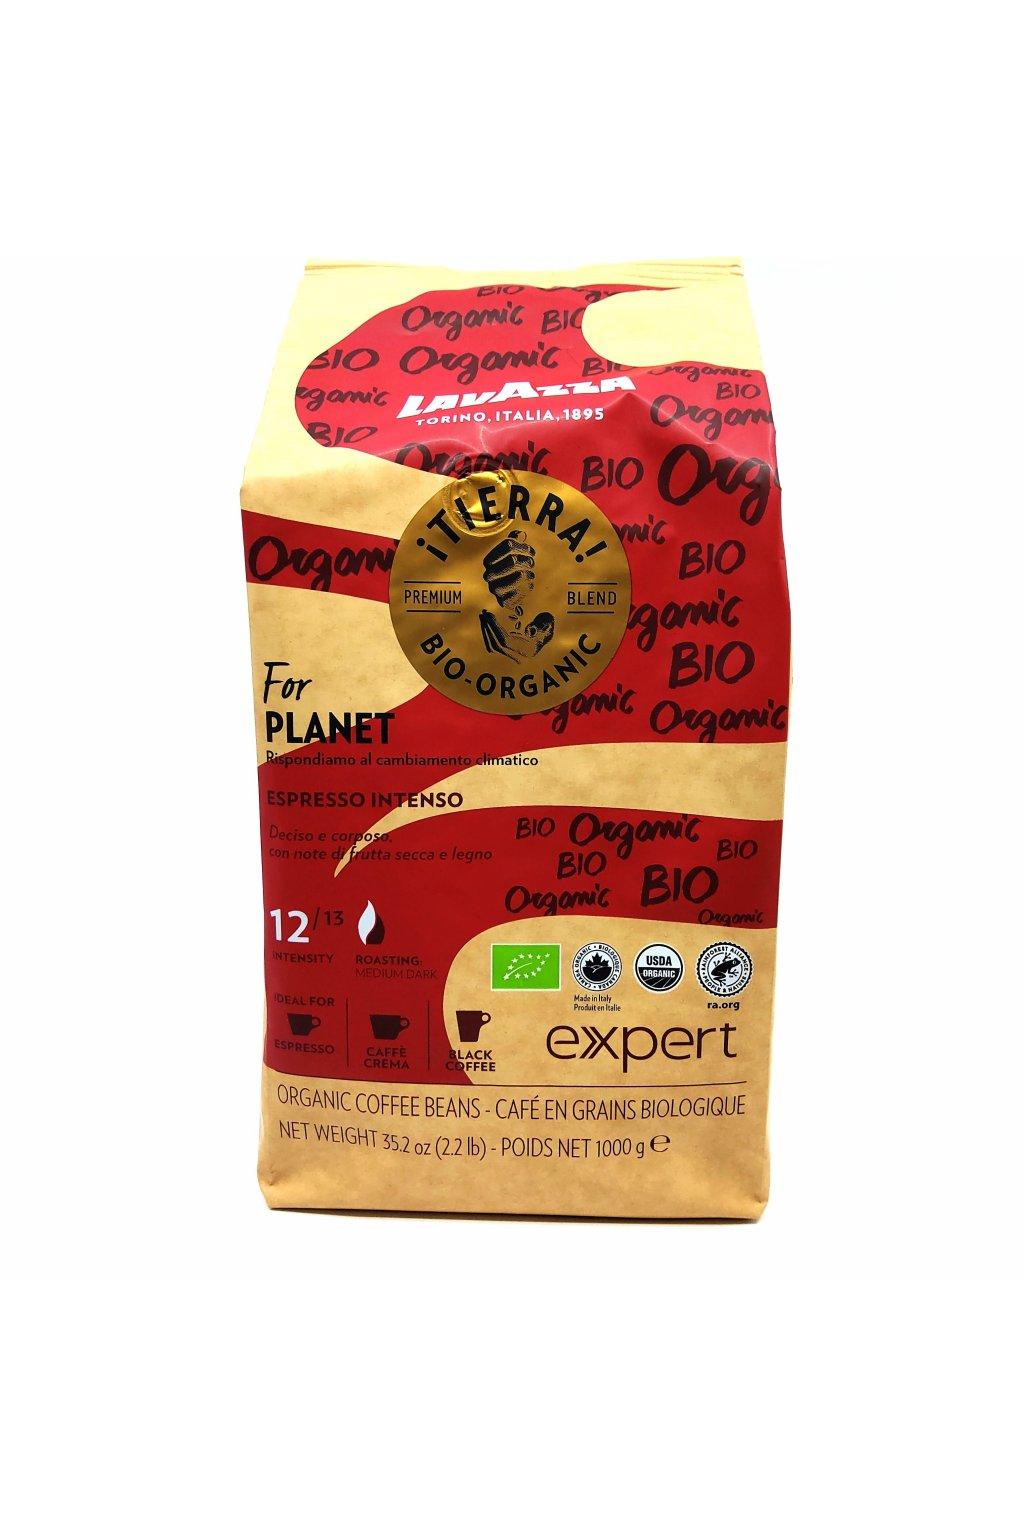 1382 lavazza tierra bio organic zrnkova 1 kg